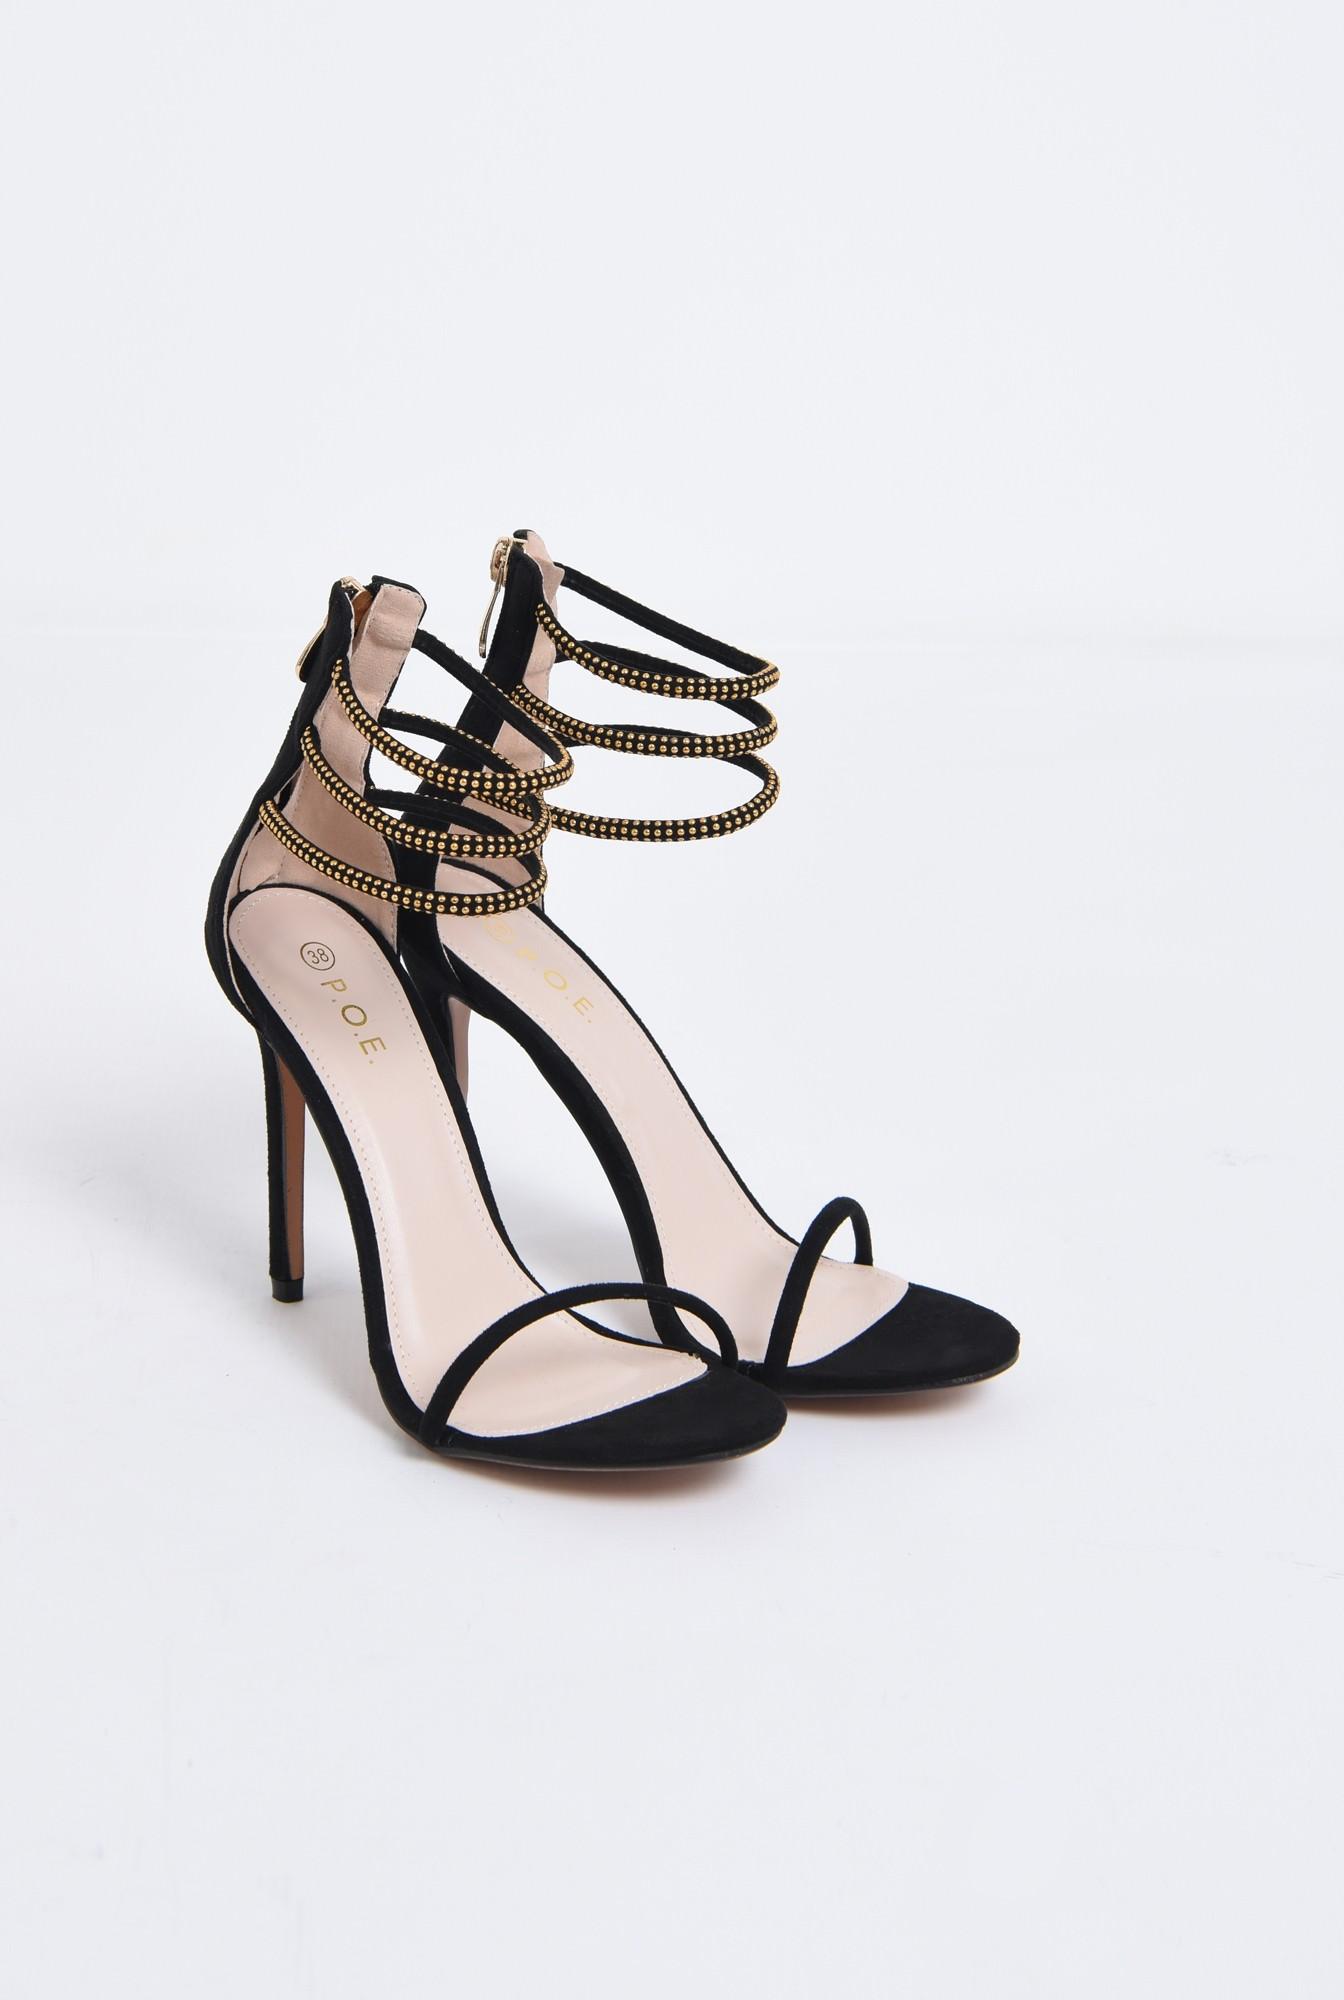 sandale elegante, negre, toc inalt, barete cu aplicatii metalice